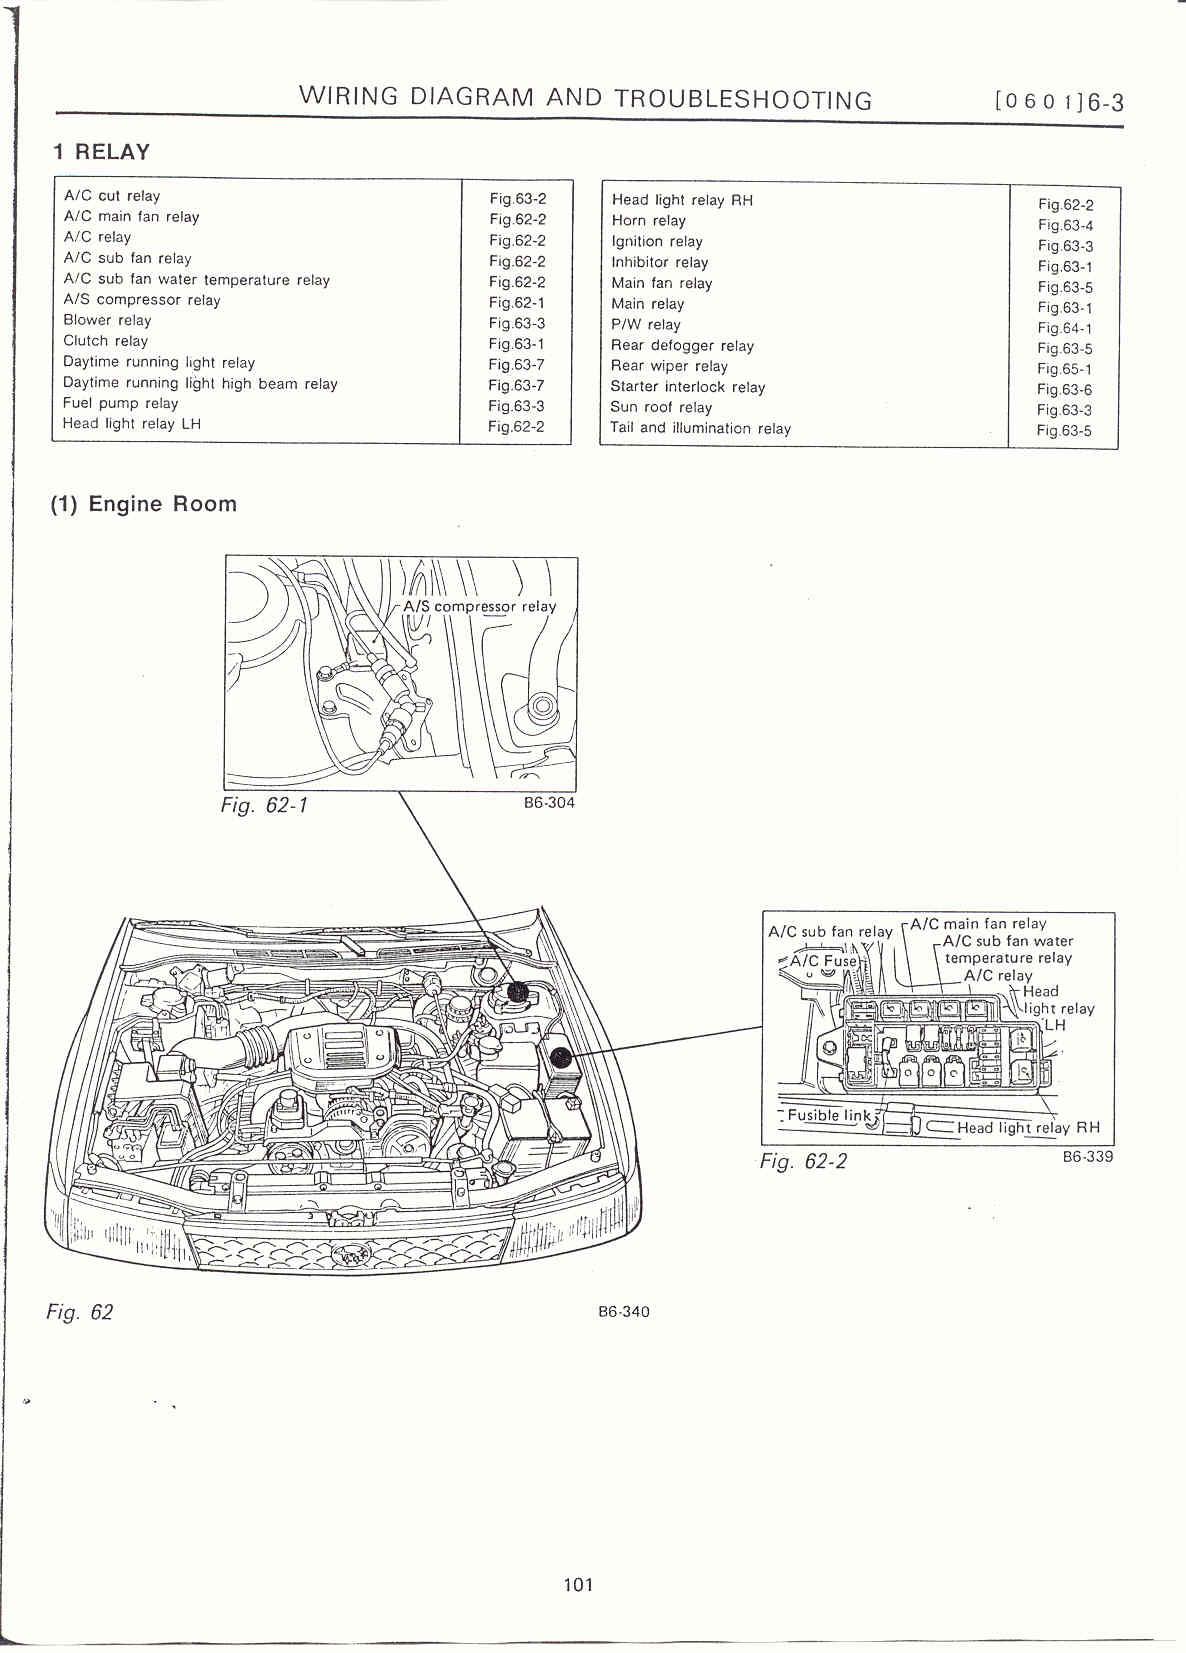 2005 subaru impreza audio wiring diagram for electric guitar 2013 sti harness auto